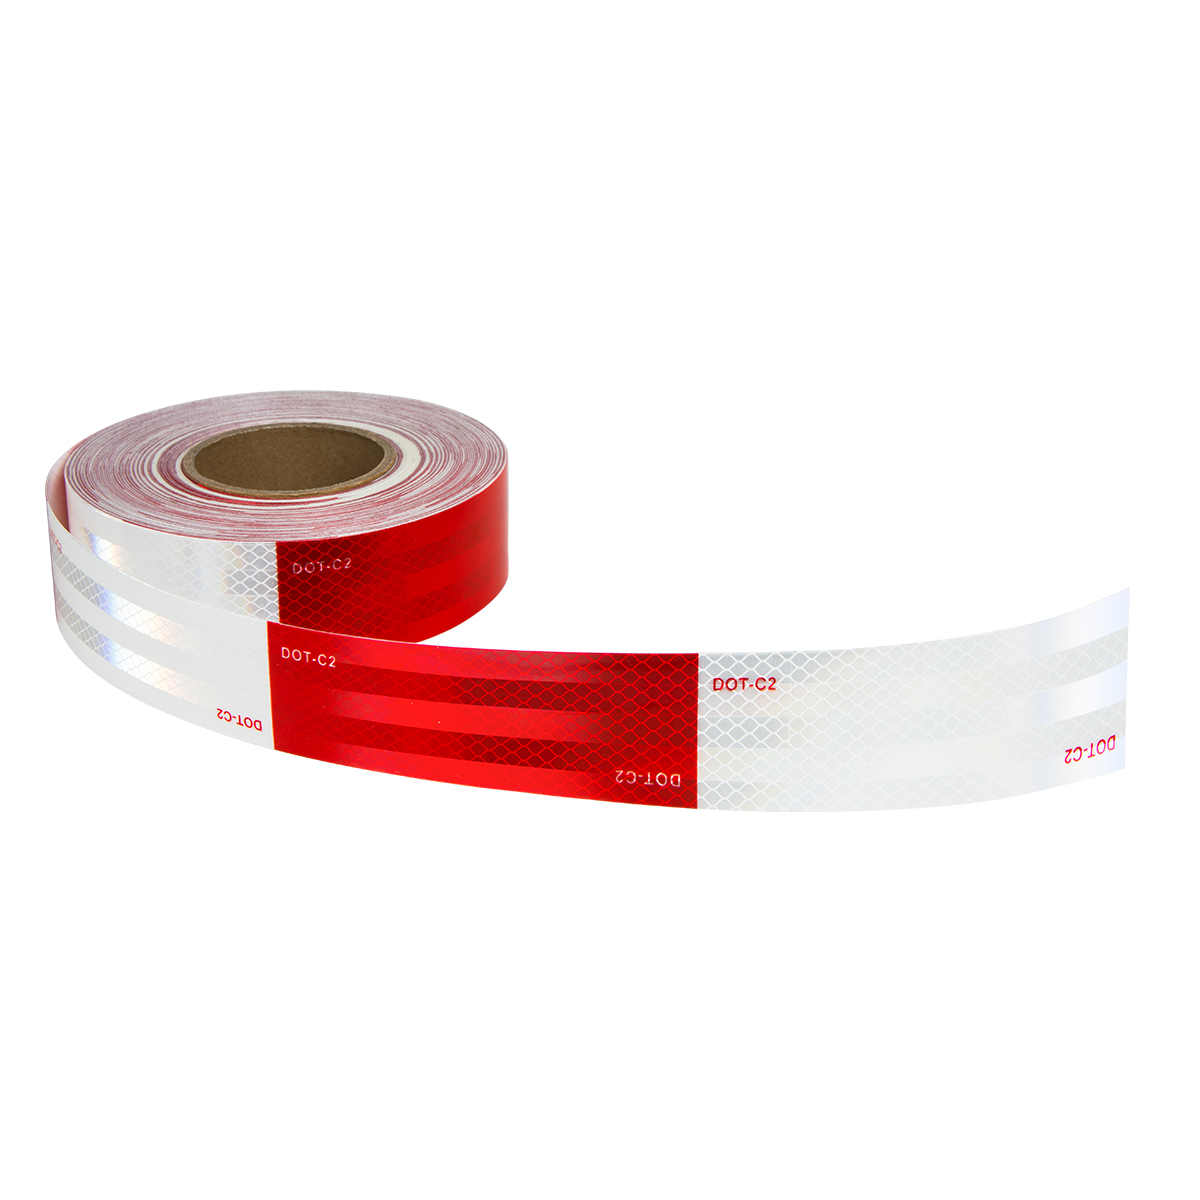 92296 Premium Hi Viz DOT-C2 Conspicuity Tape in Red & White 150' Roll